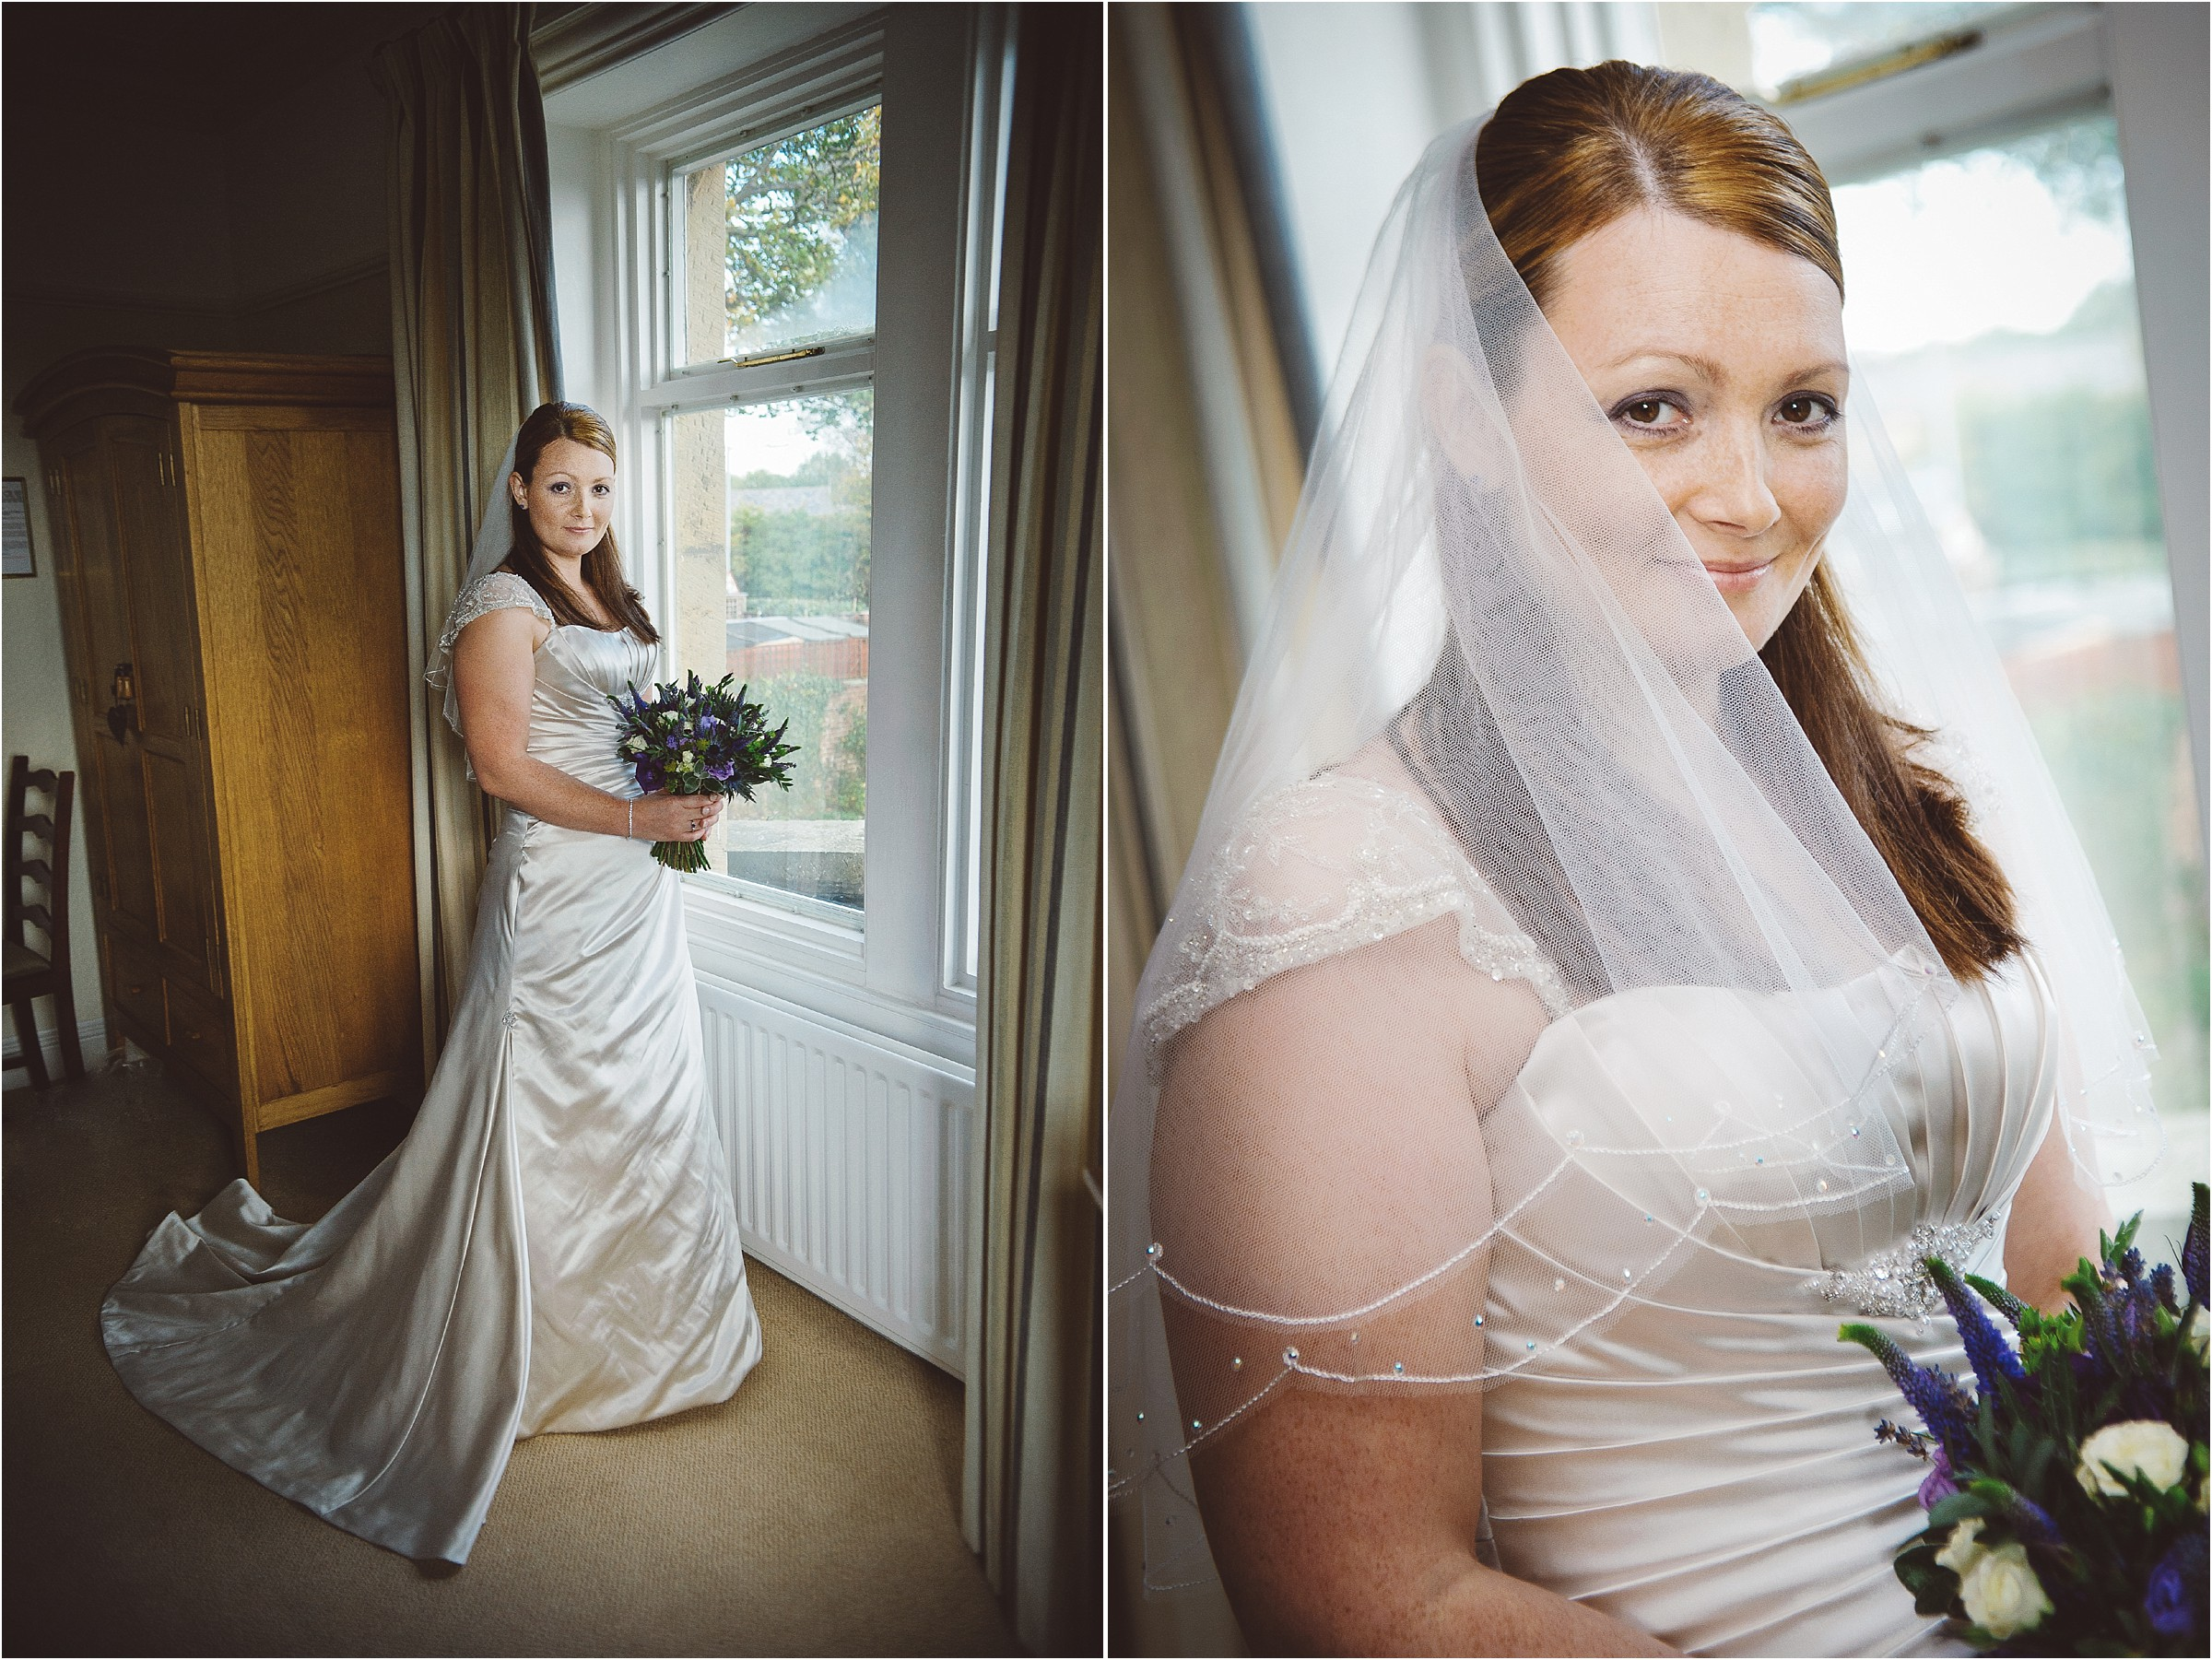 008 wedding photography doxford hall northumberlandDSC_0498e